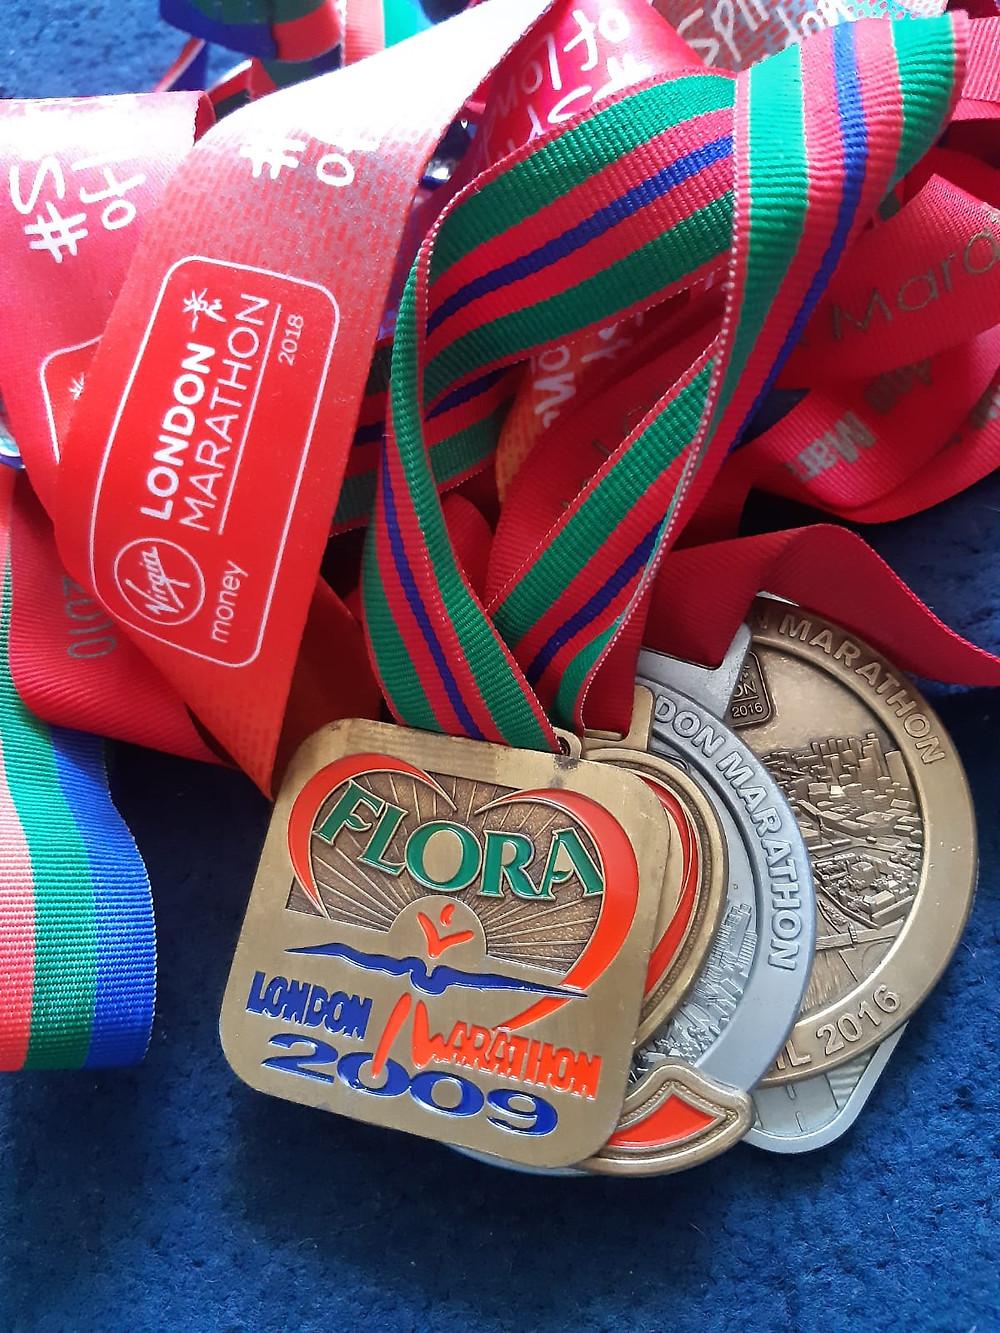 Ronnie's London Marathon medals